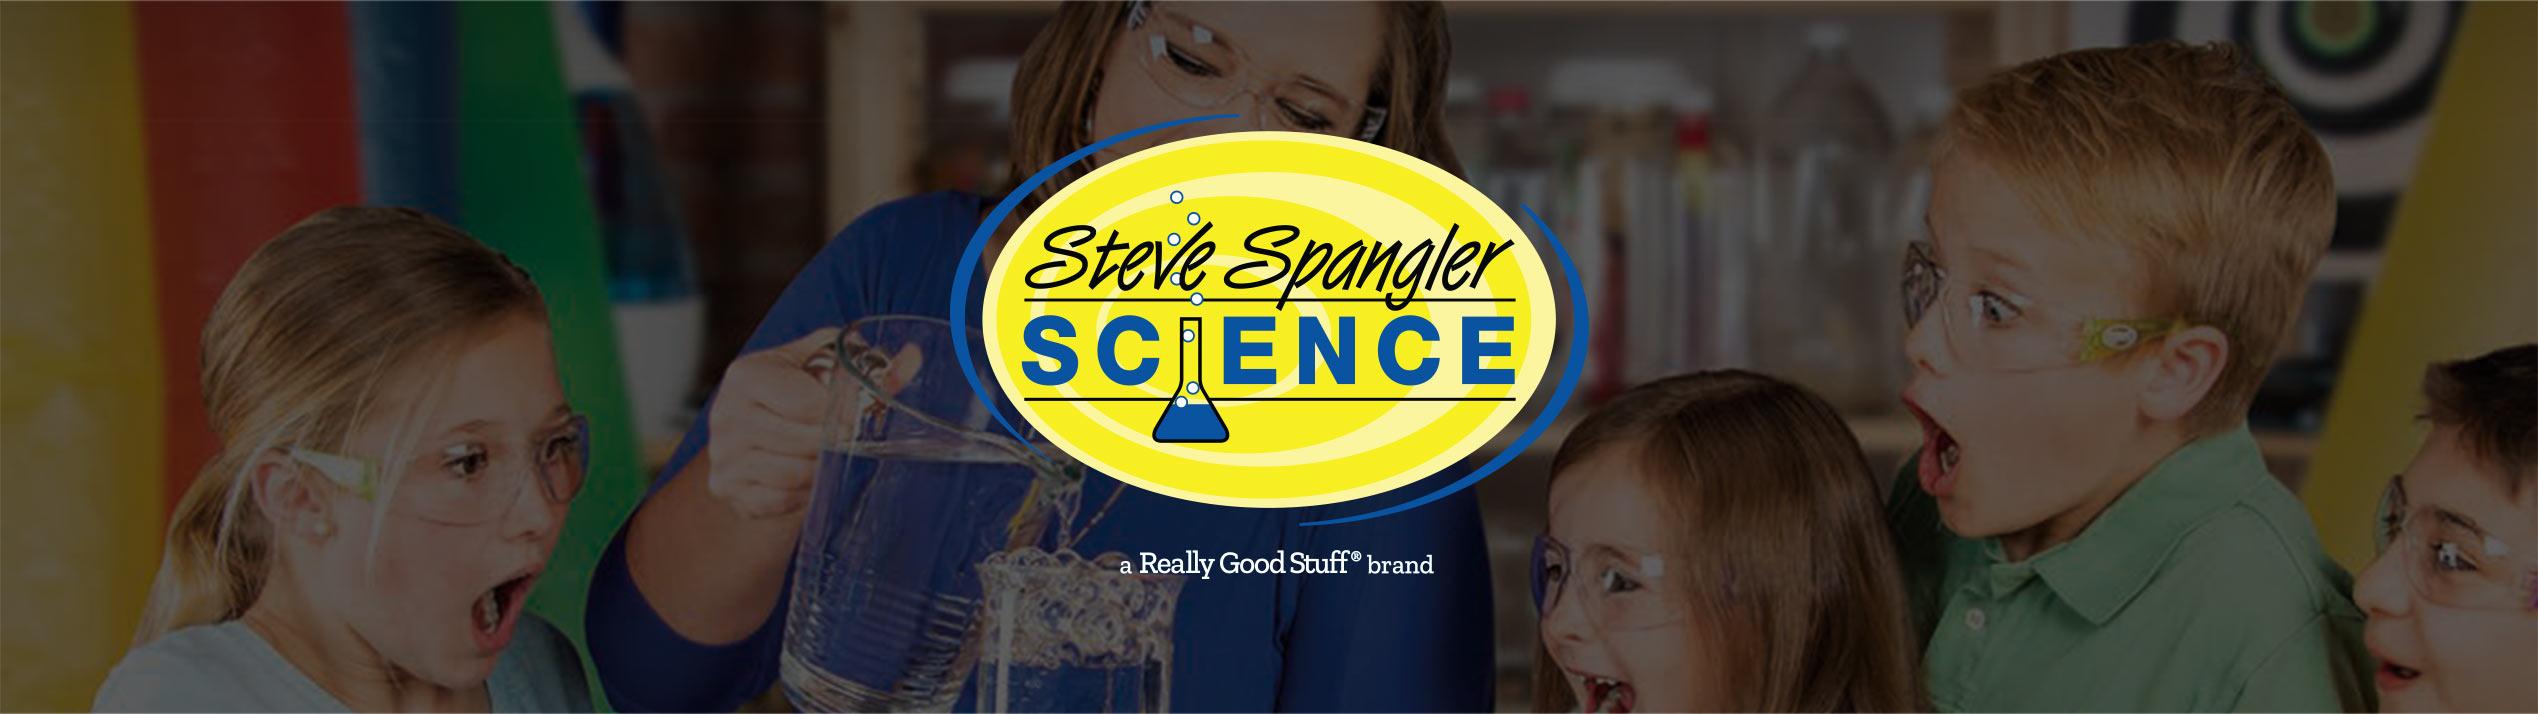 Steve Spangler Science—a Really Good Stuff® brand